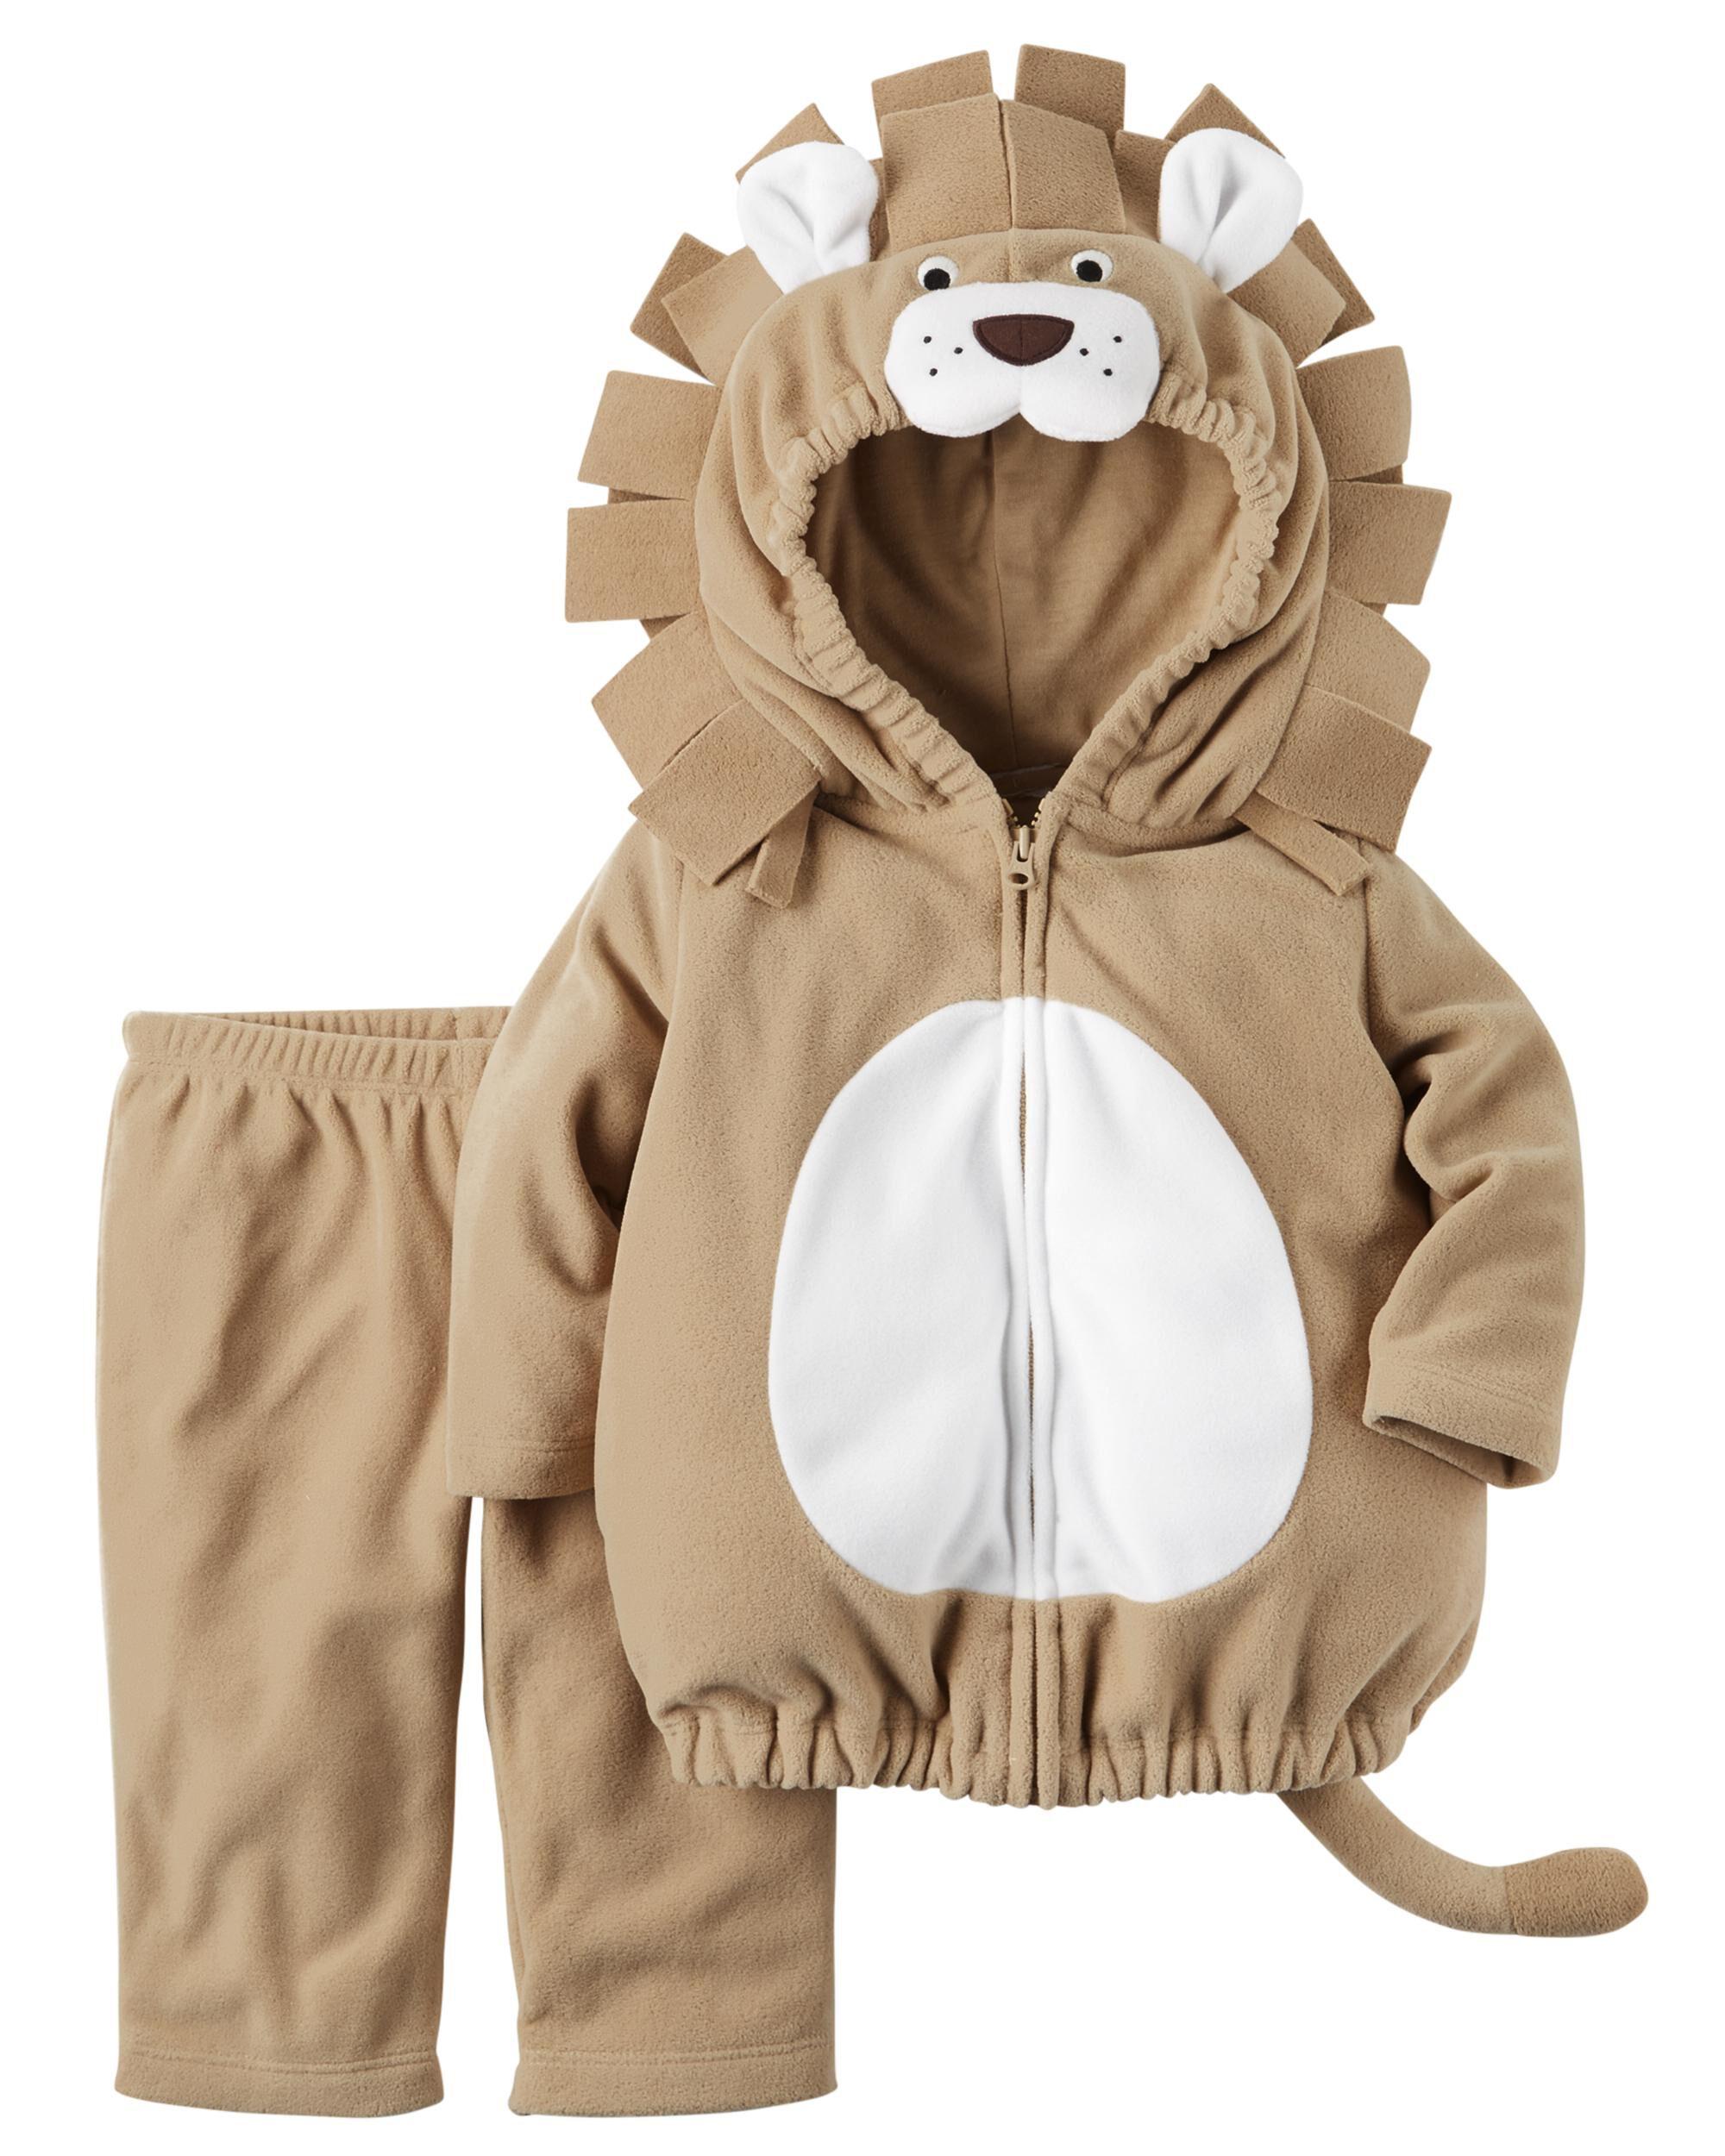 Little Lion Halloween Costume ...  sc 1 st  Skip Hop & Rewarding Moments | Carteru0027s